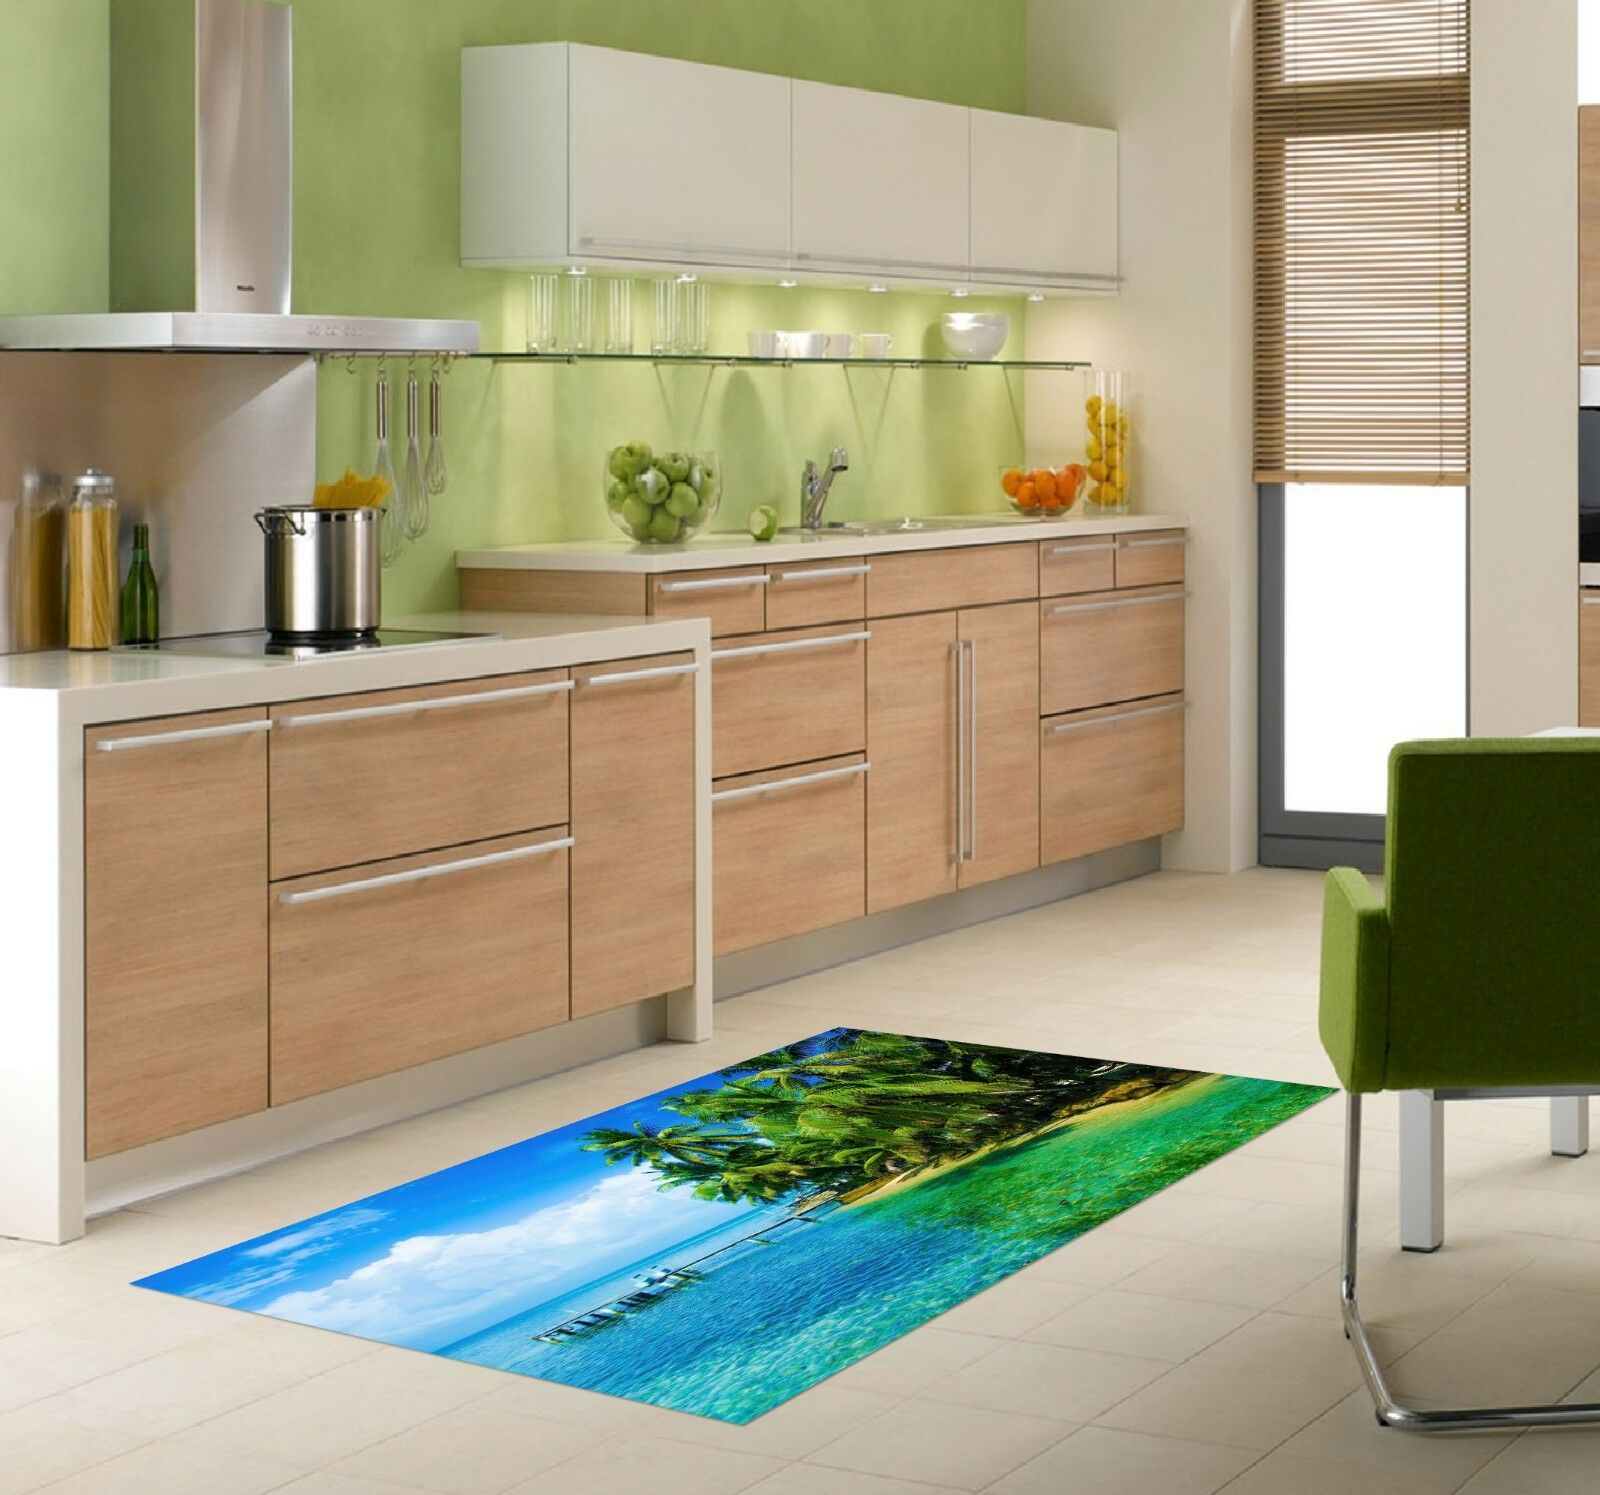 3D Coconut Island 70 Kitchen Mat Floor Murals Wall Print Wall Deco UK Carly